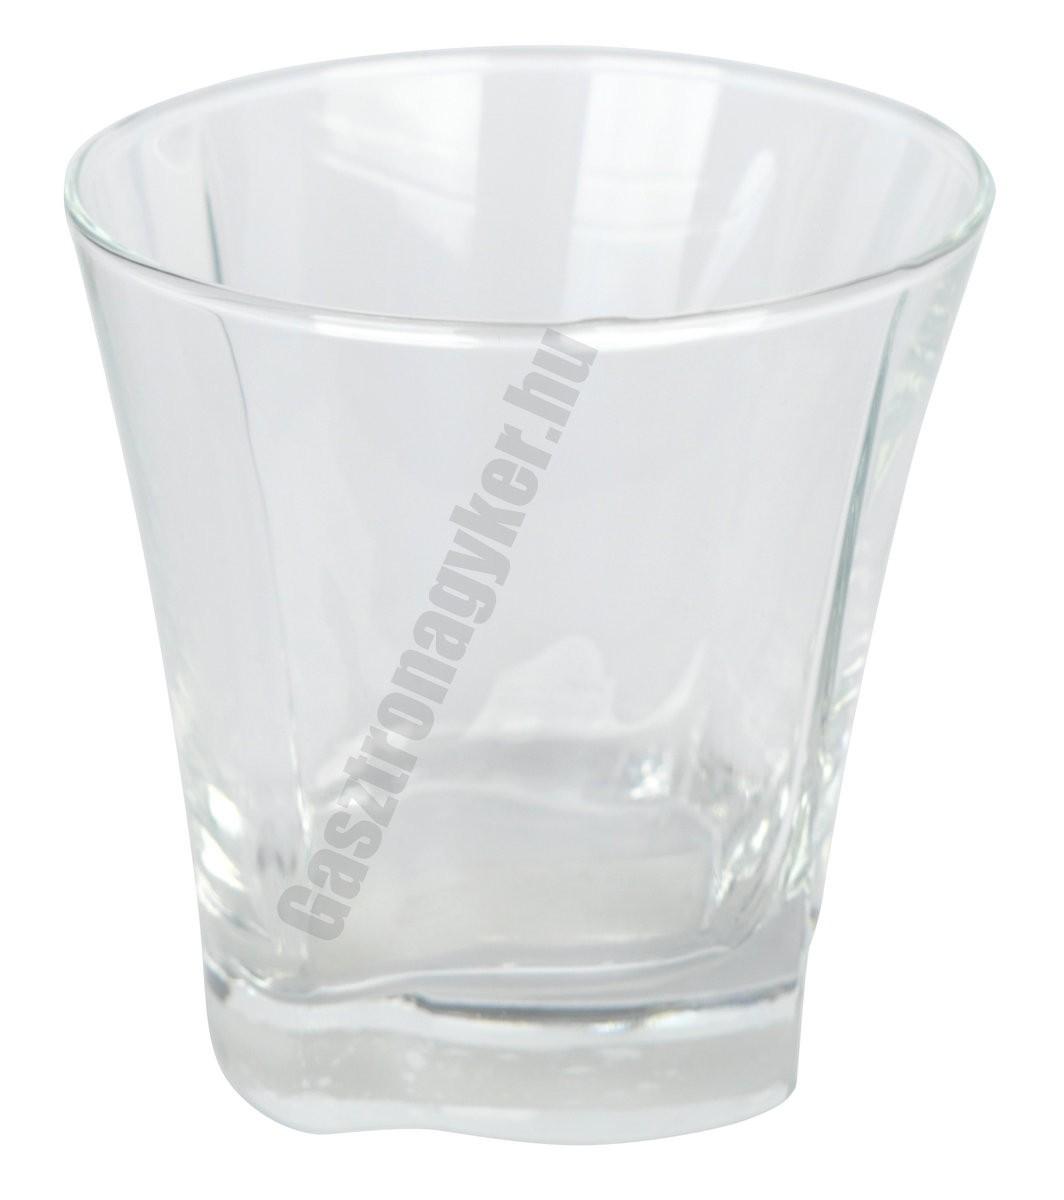 Truva vizes-whisky pohár, 280 ml, üveg